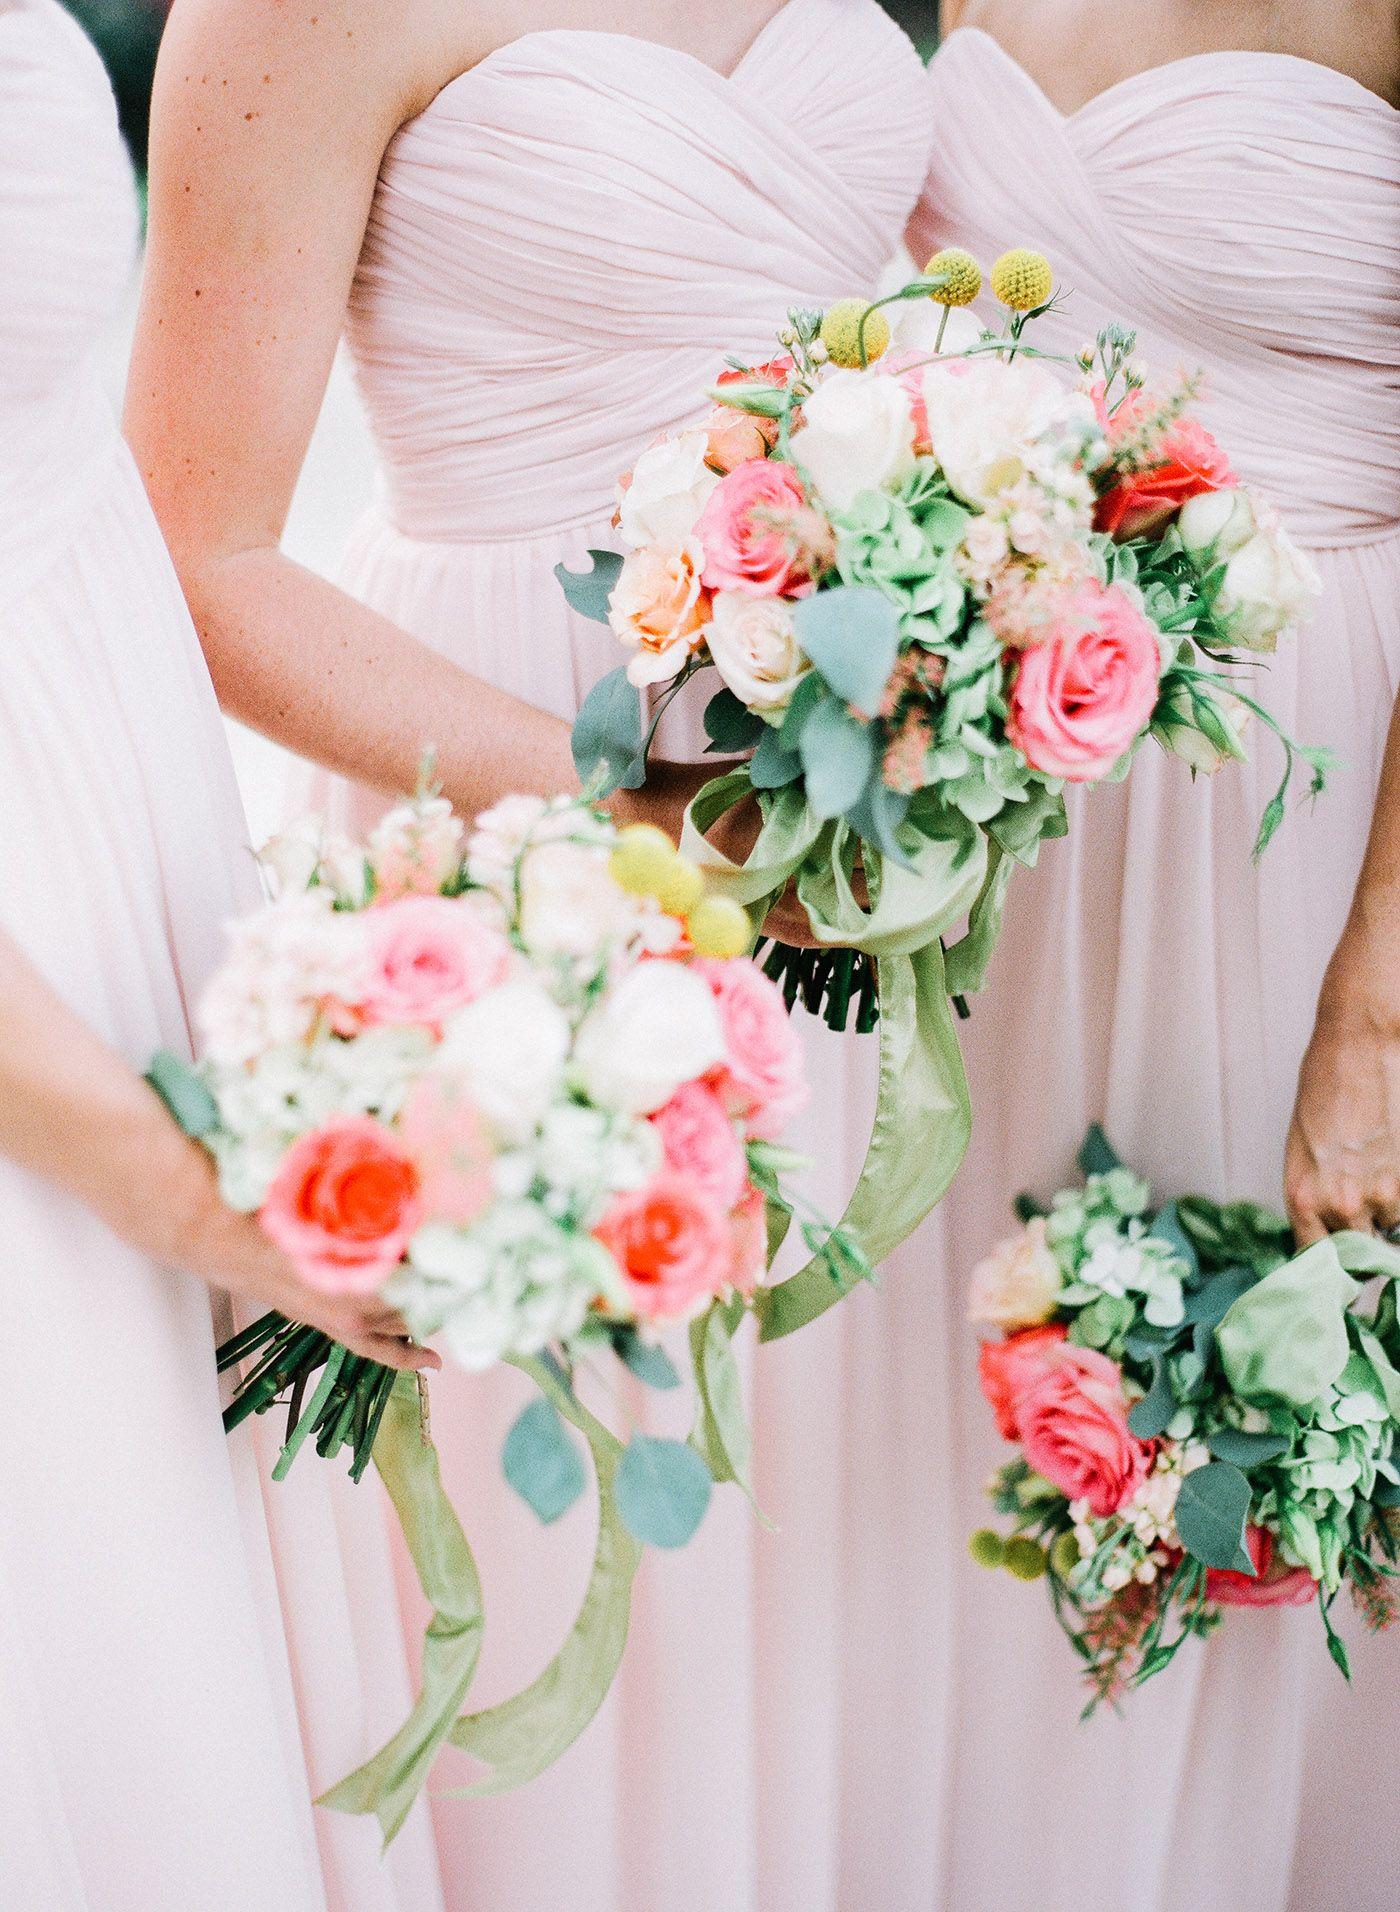 Bridesmaid bouquets pink bridesmaid dresses flowers by susan bridesmaid bouquets pink bridesmaid dresses flowers by susan huff beth jordan birmingham dhlflorist Choice Image